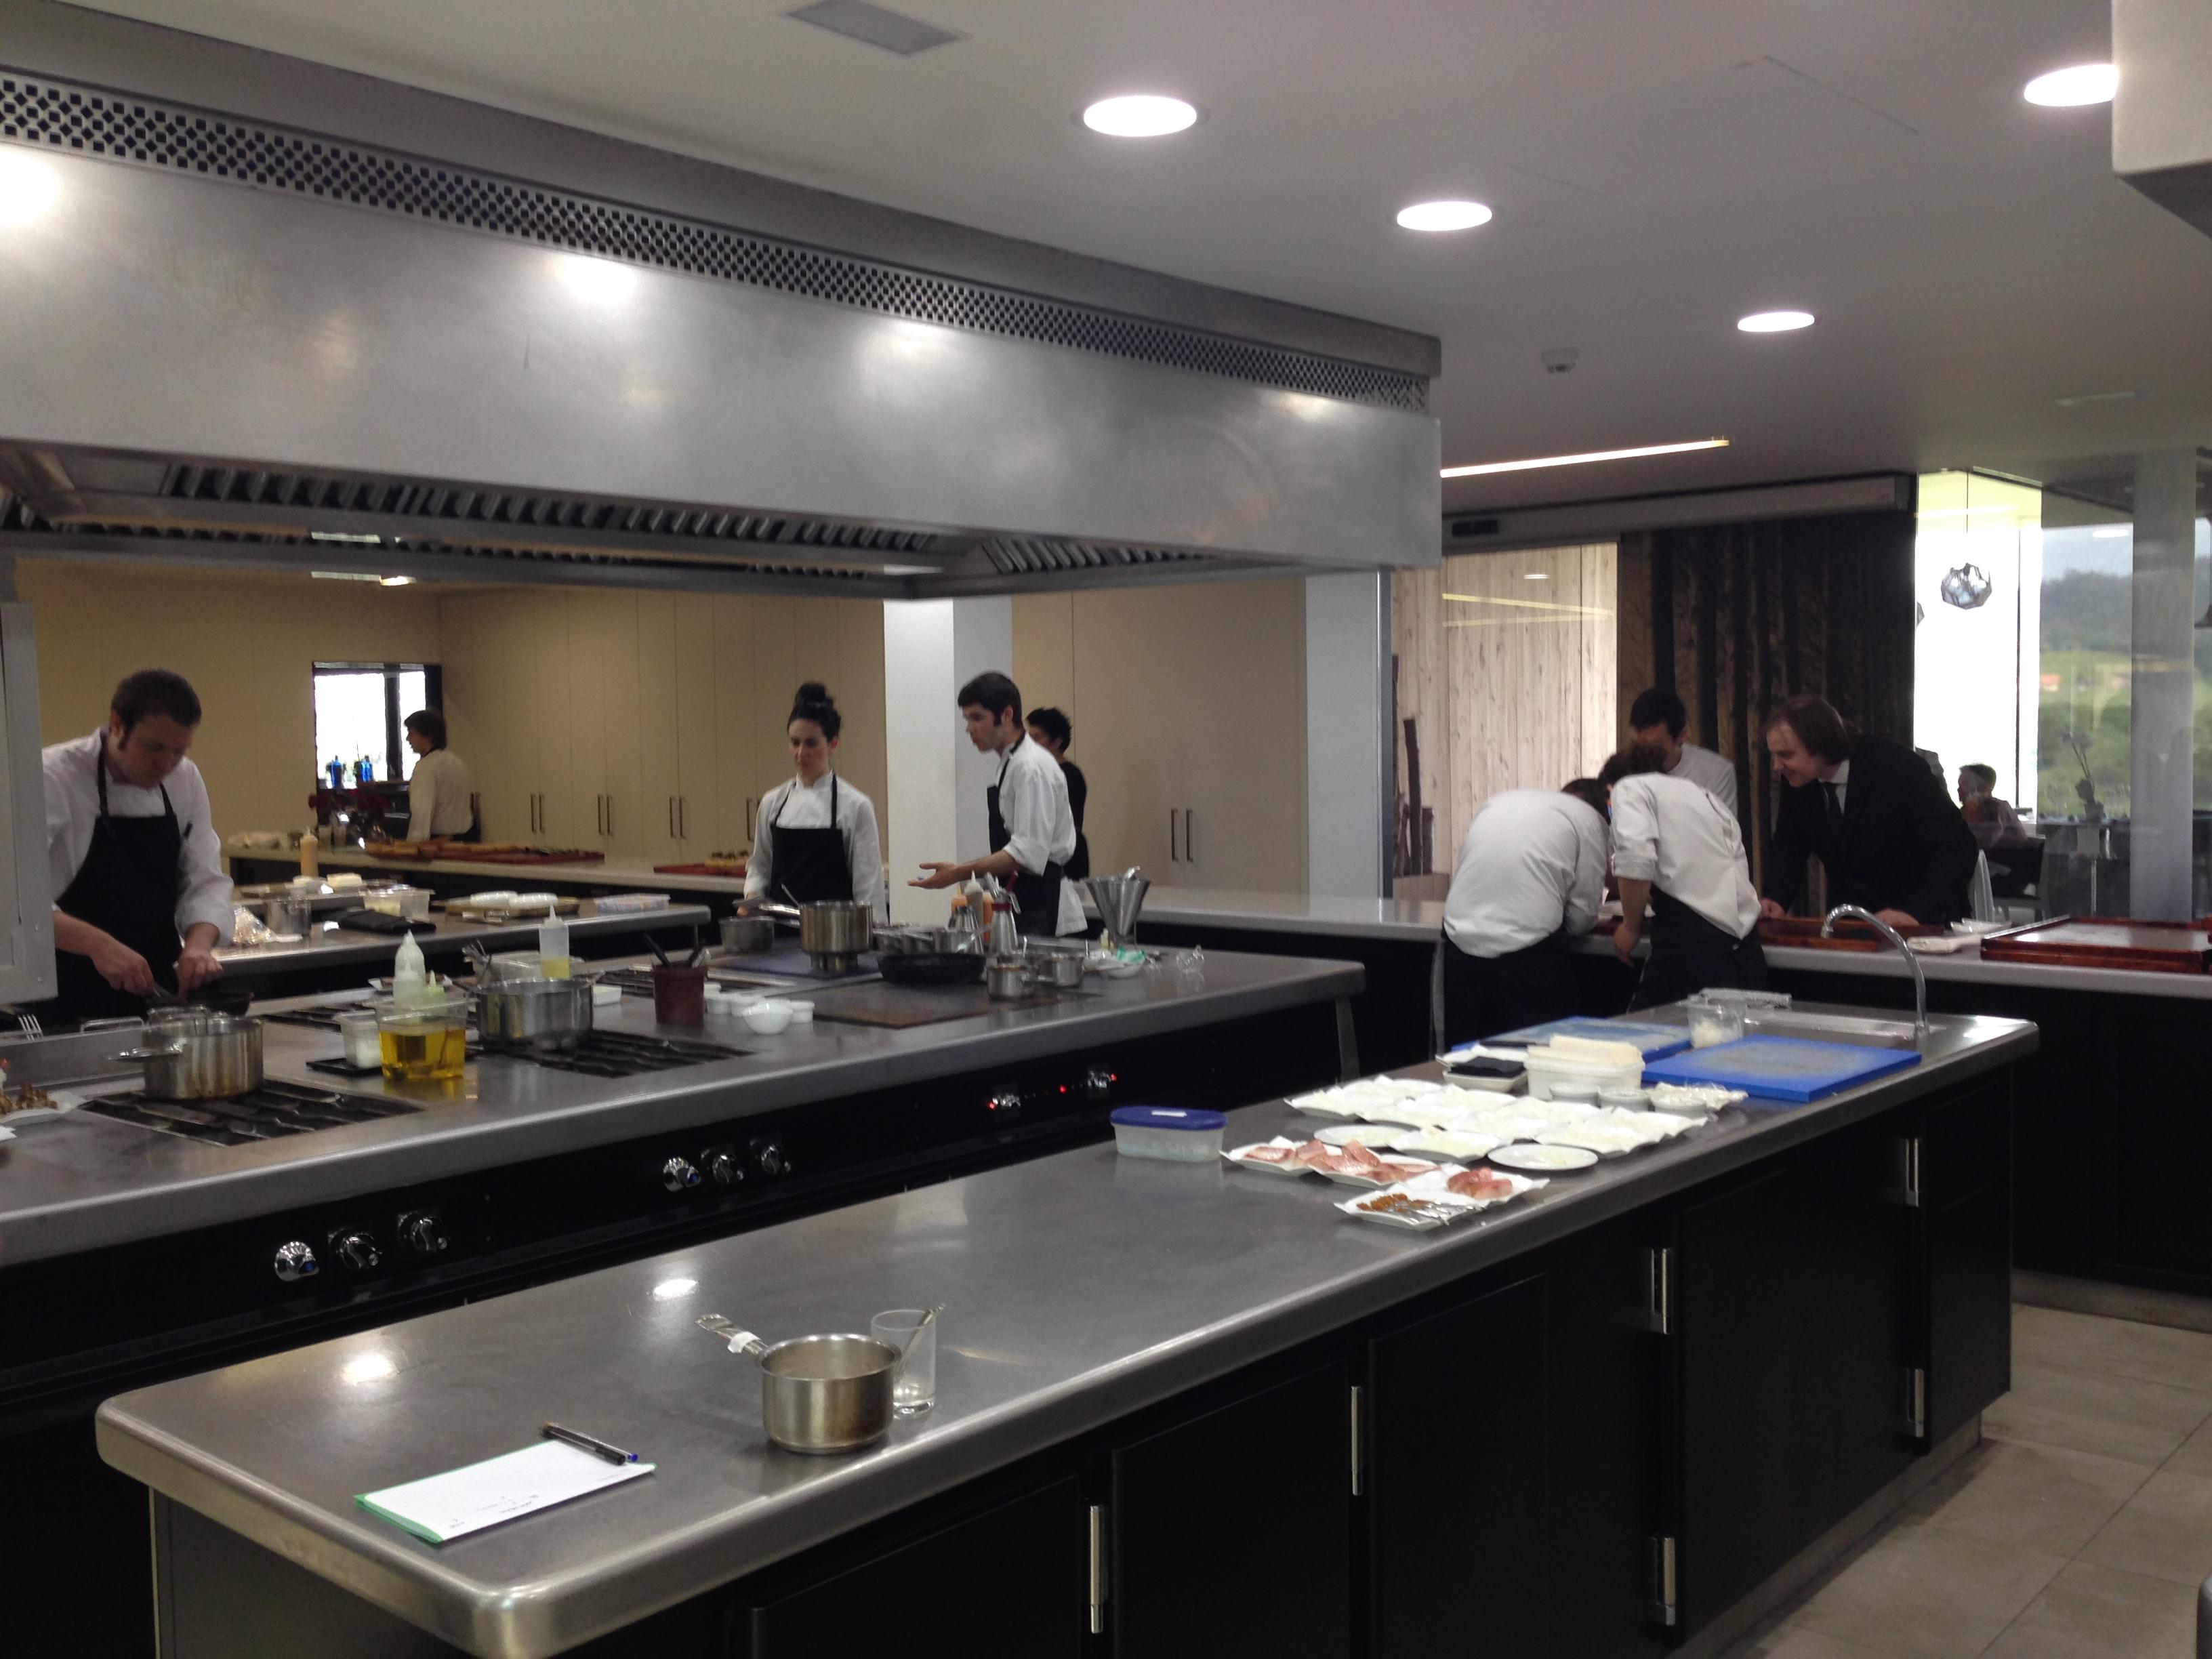 Azurmendi cocina 2 dime un restaurante - Restaurante singapur valencia ...